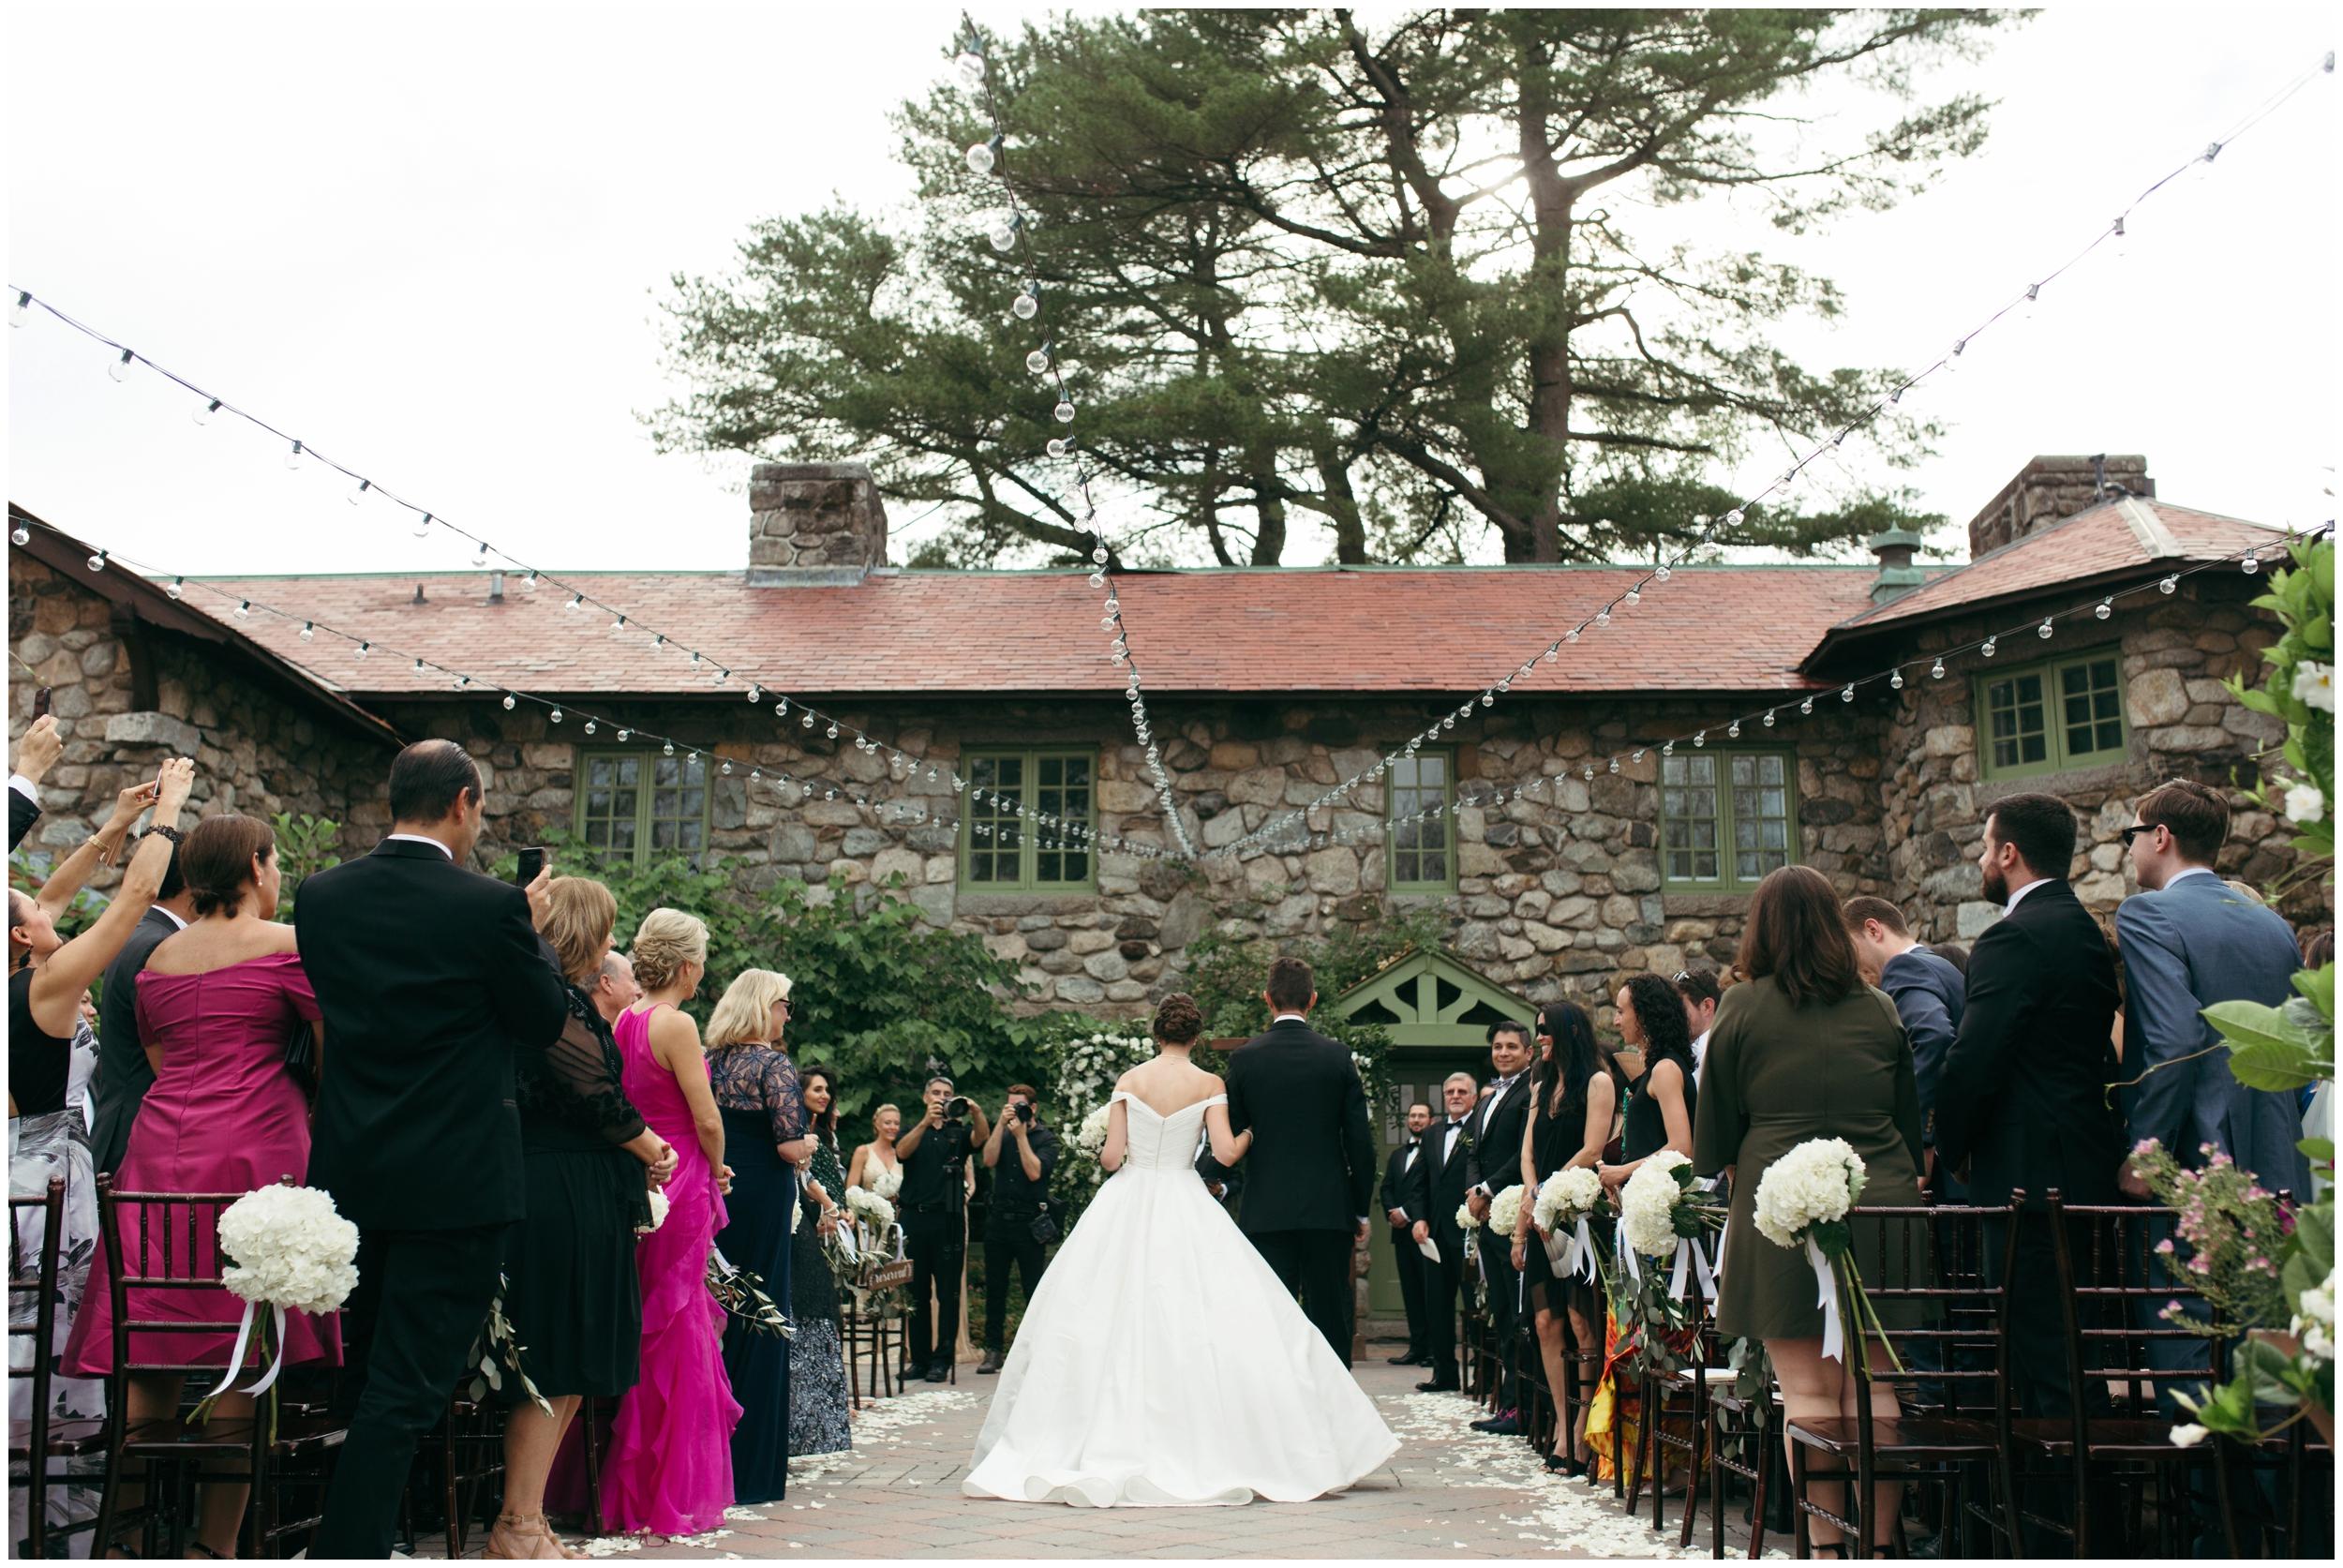 Willowdale-Estate-Wedding-Bailey-Q-Photo-Boston-Wedding-Photographer-028.JPG